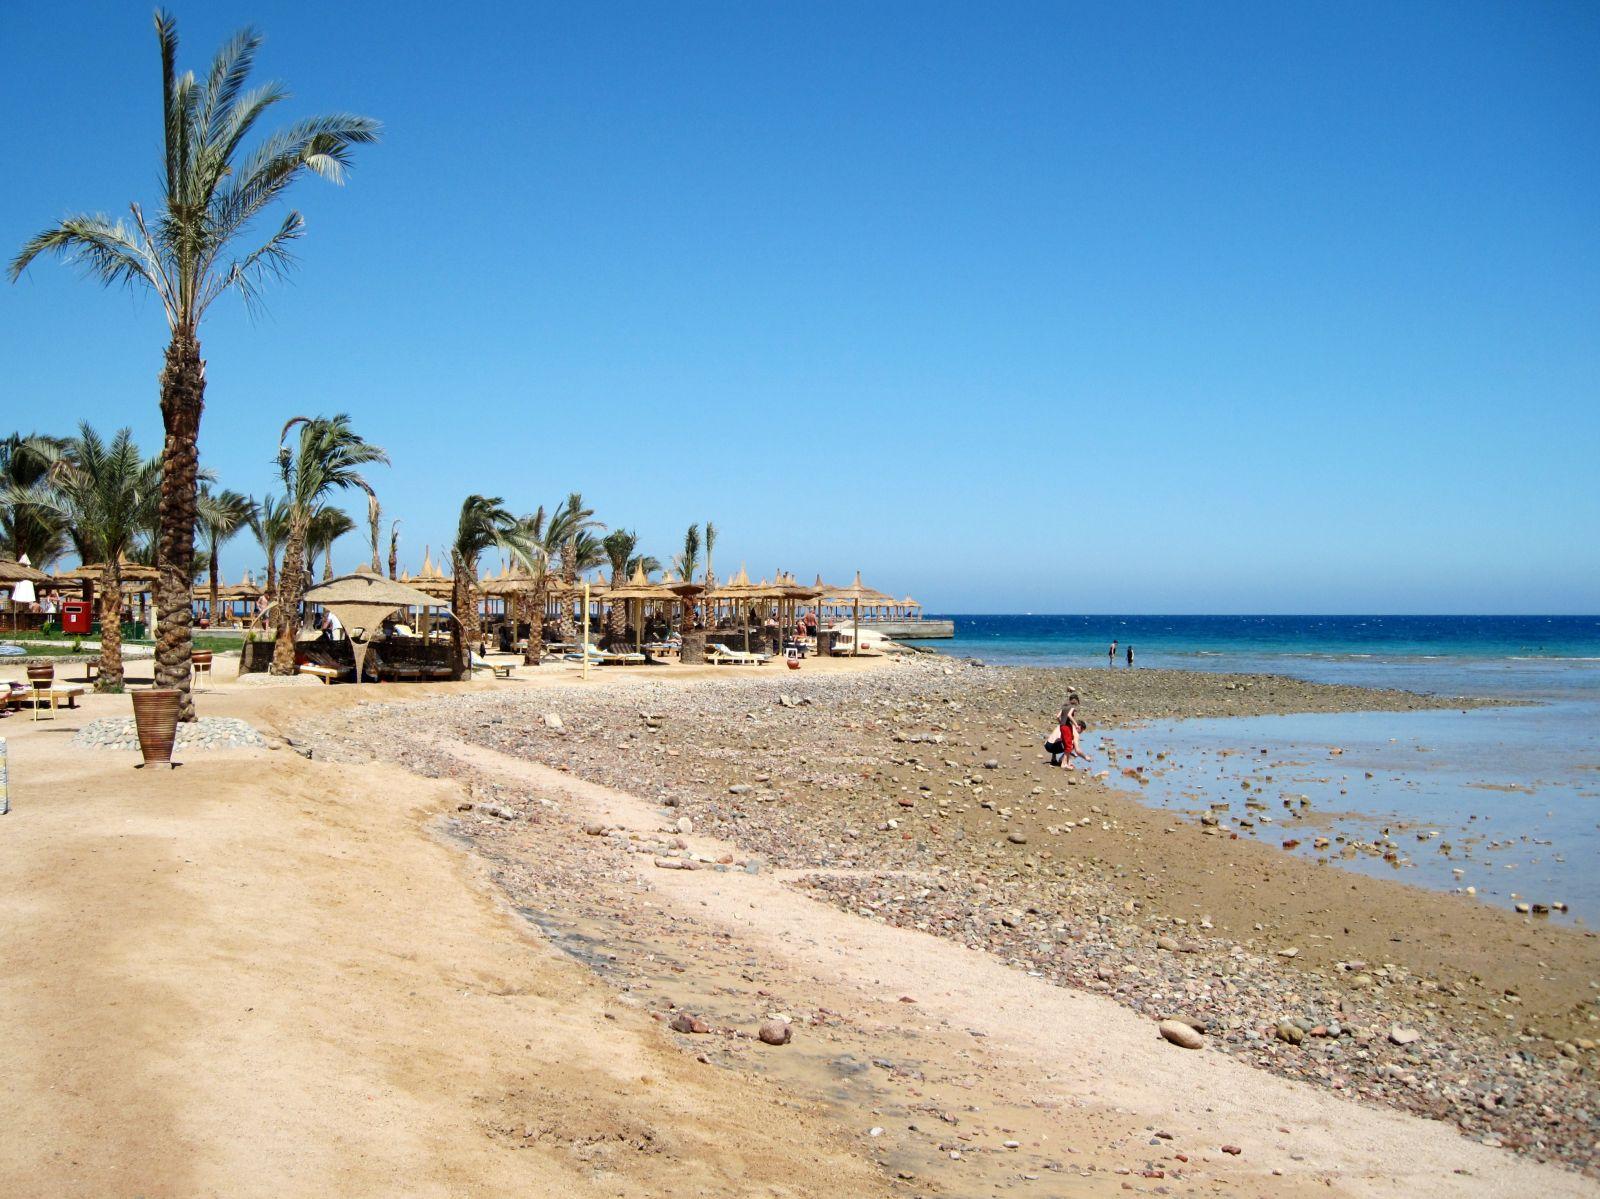 hurghada, egypte, hotel titanic beach en aquapark